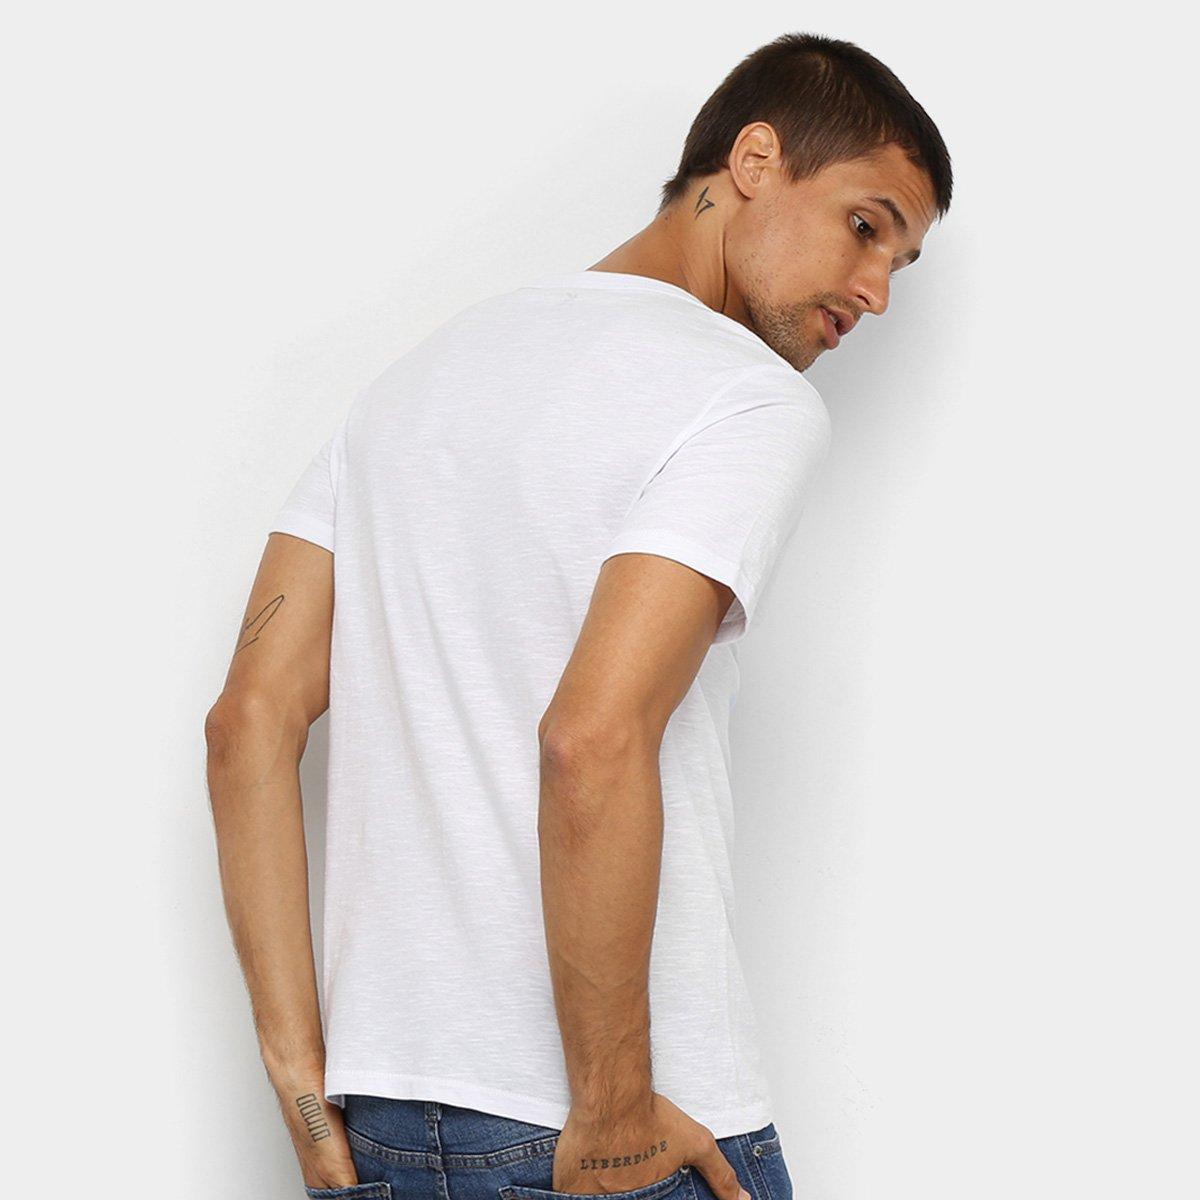 Camiseta Hering Estampada Masculina - Branco e Preto twZFb